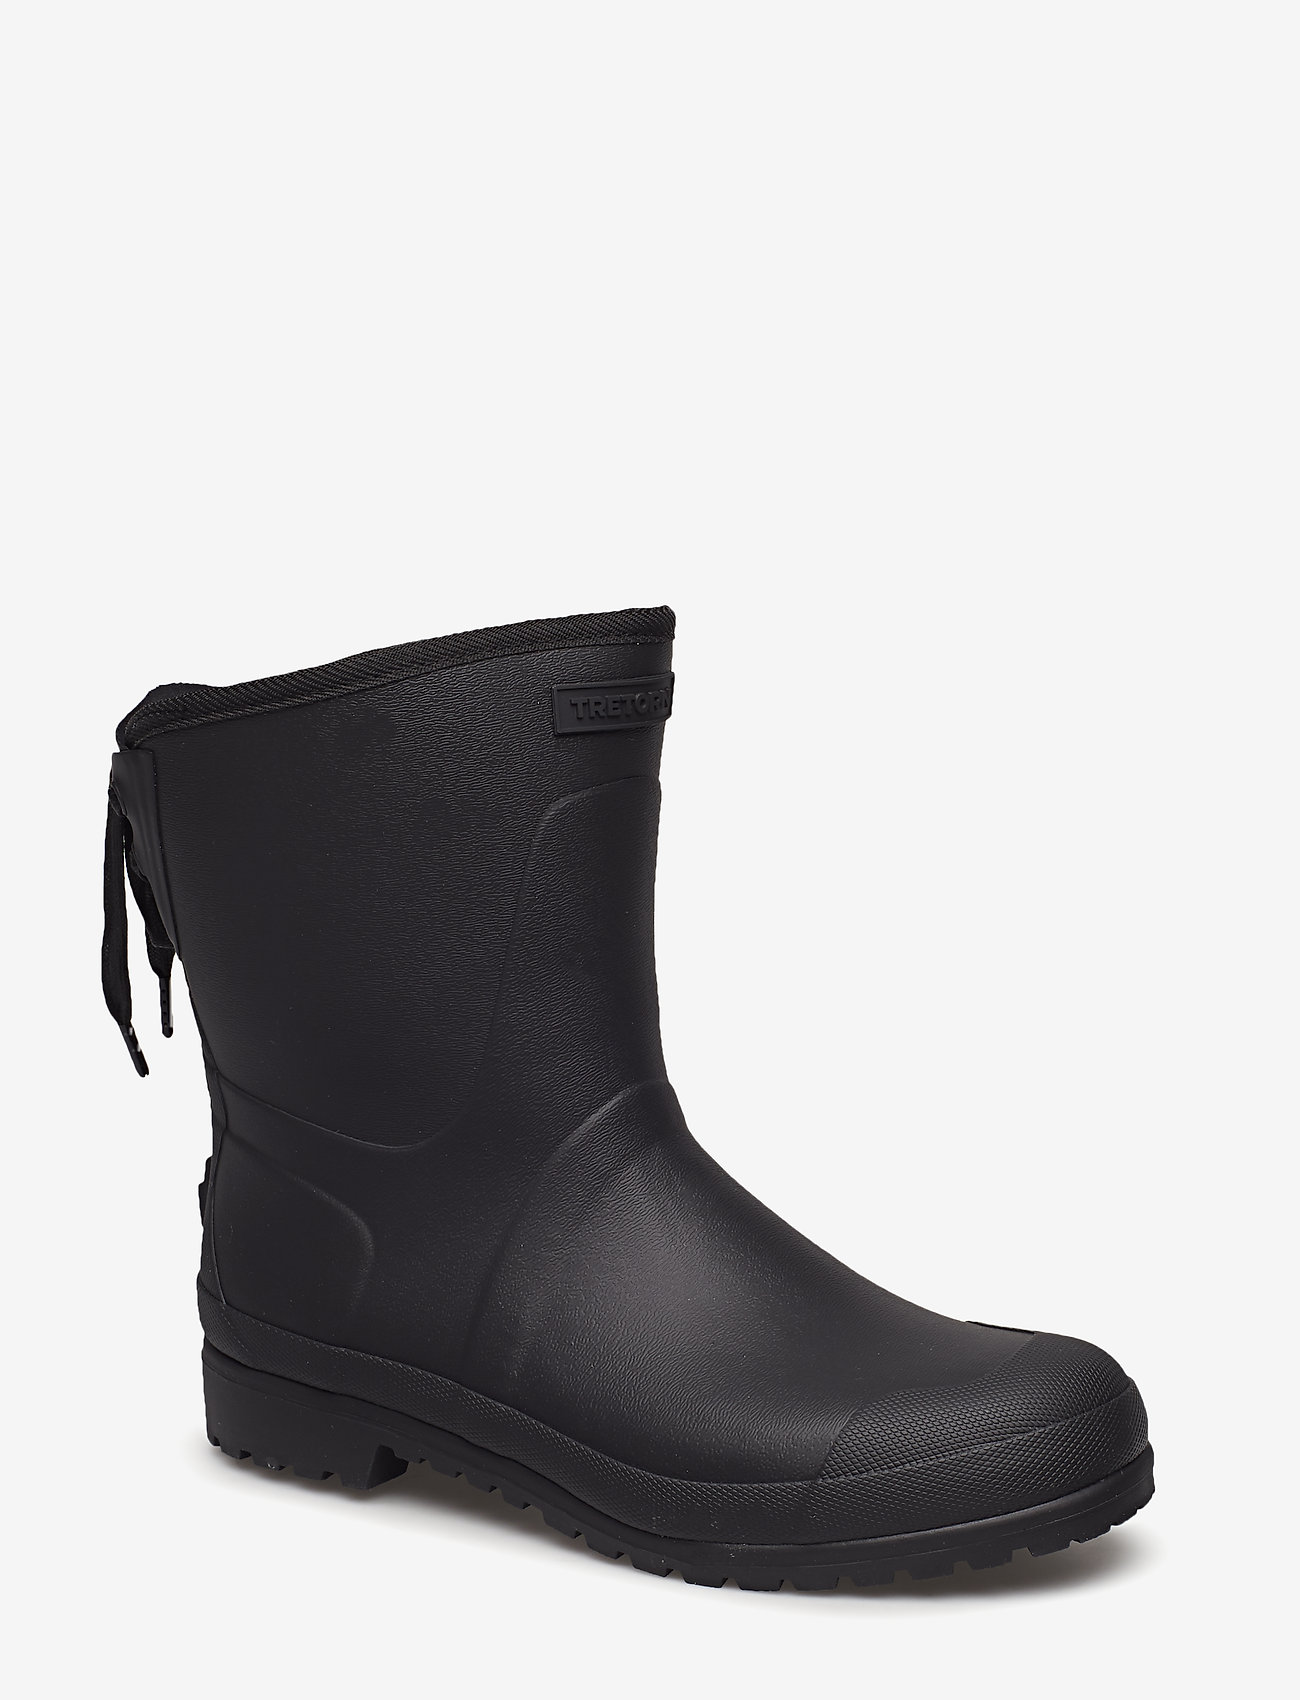 Tretorn - REDO 2.0 - rain boots - 010/black - 0